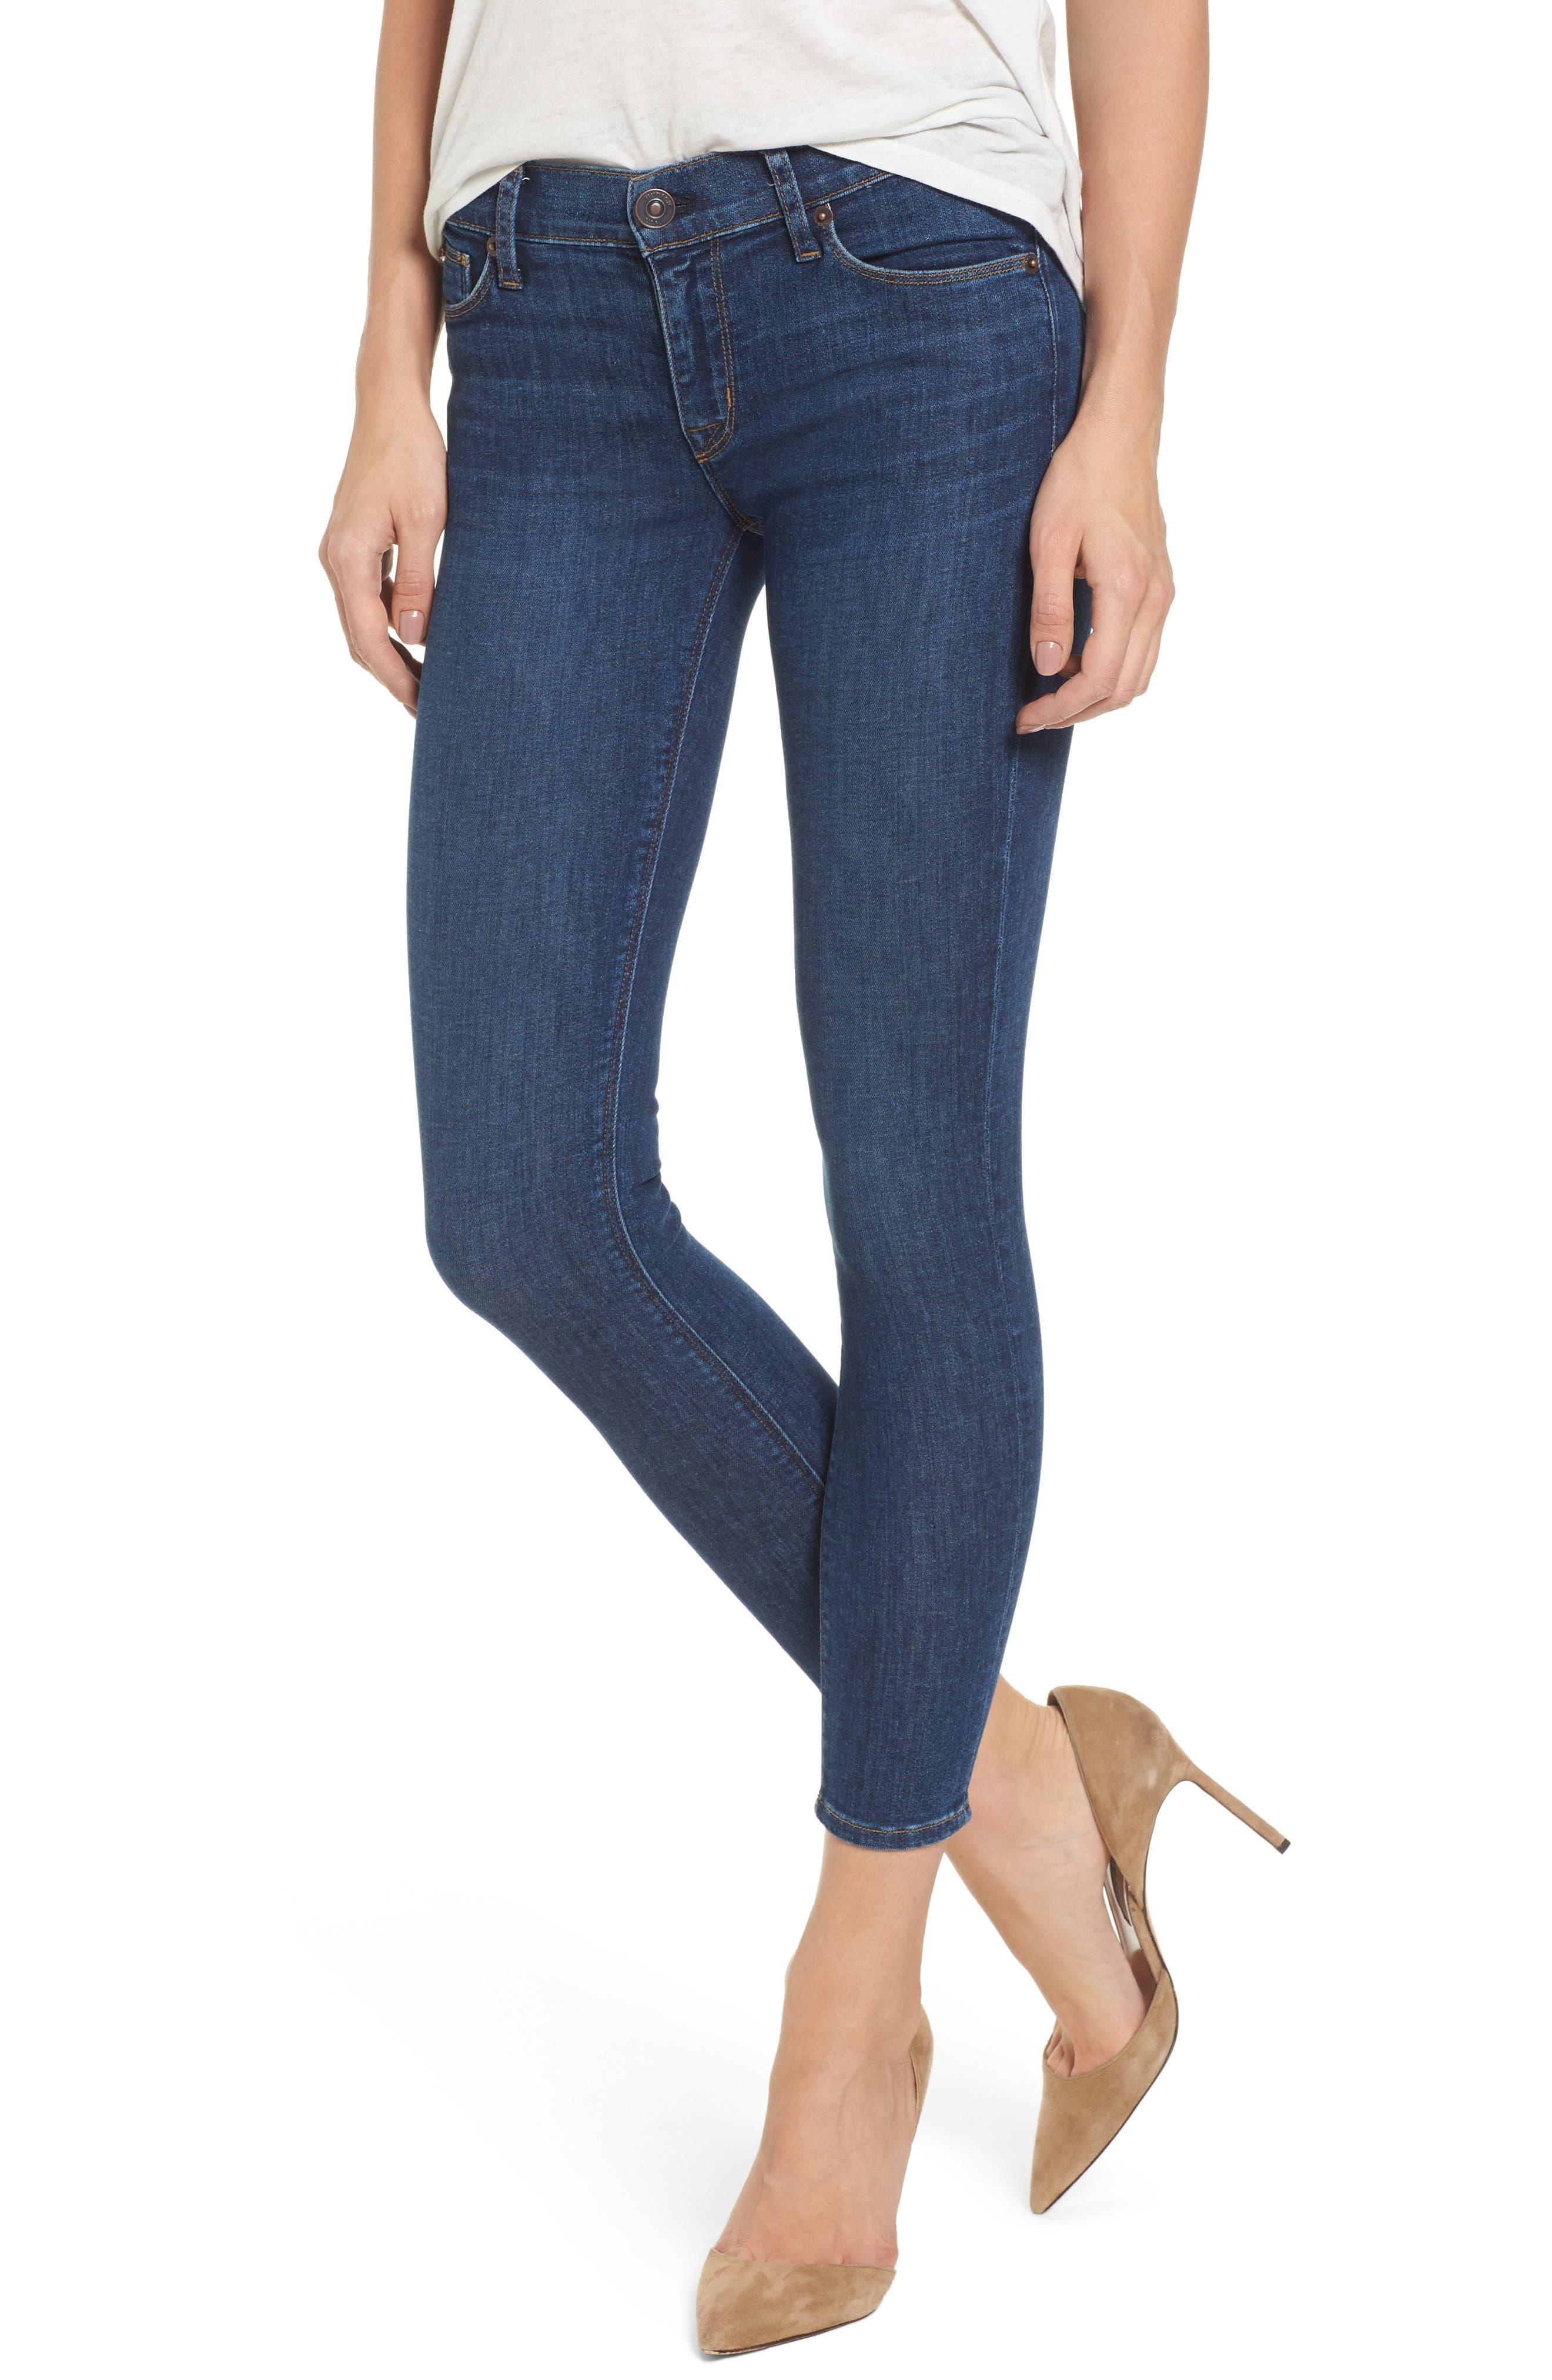 Alternate Image 1 Selected - Hudson Jeans Krista Ankle Super Skinny Jeans (Infinity)